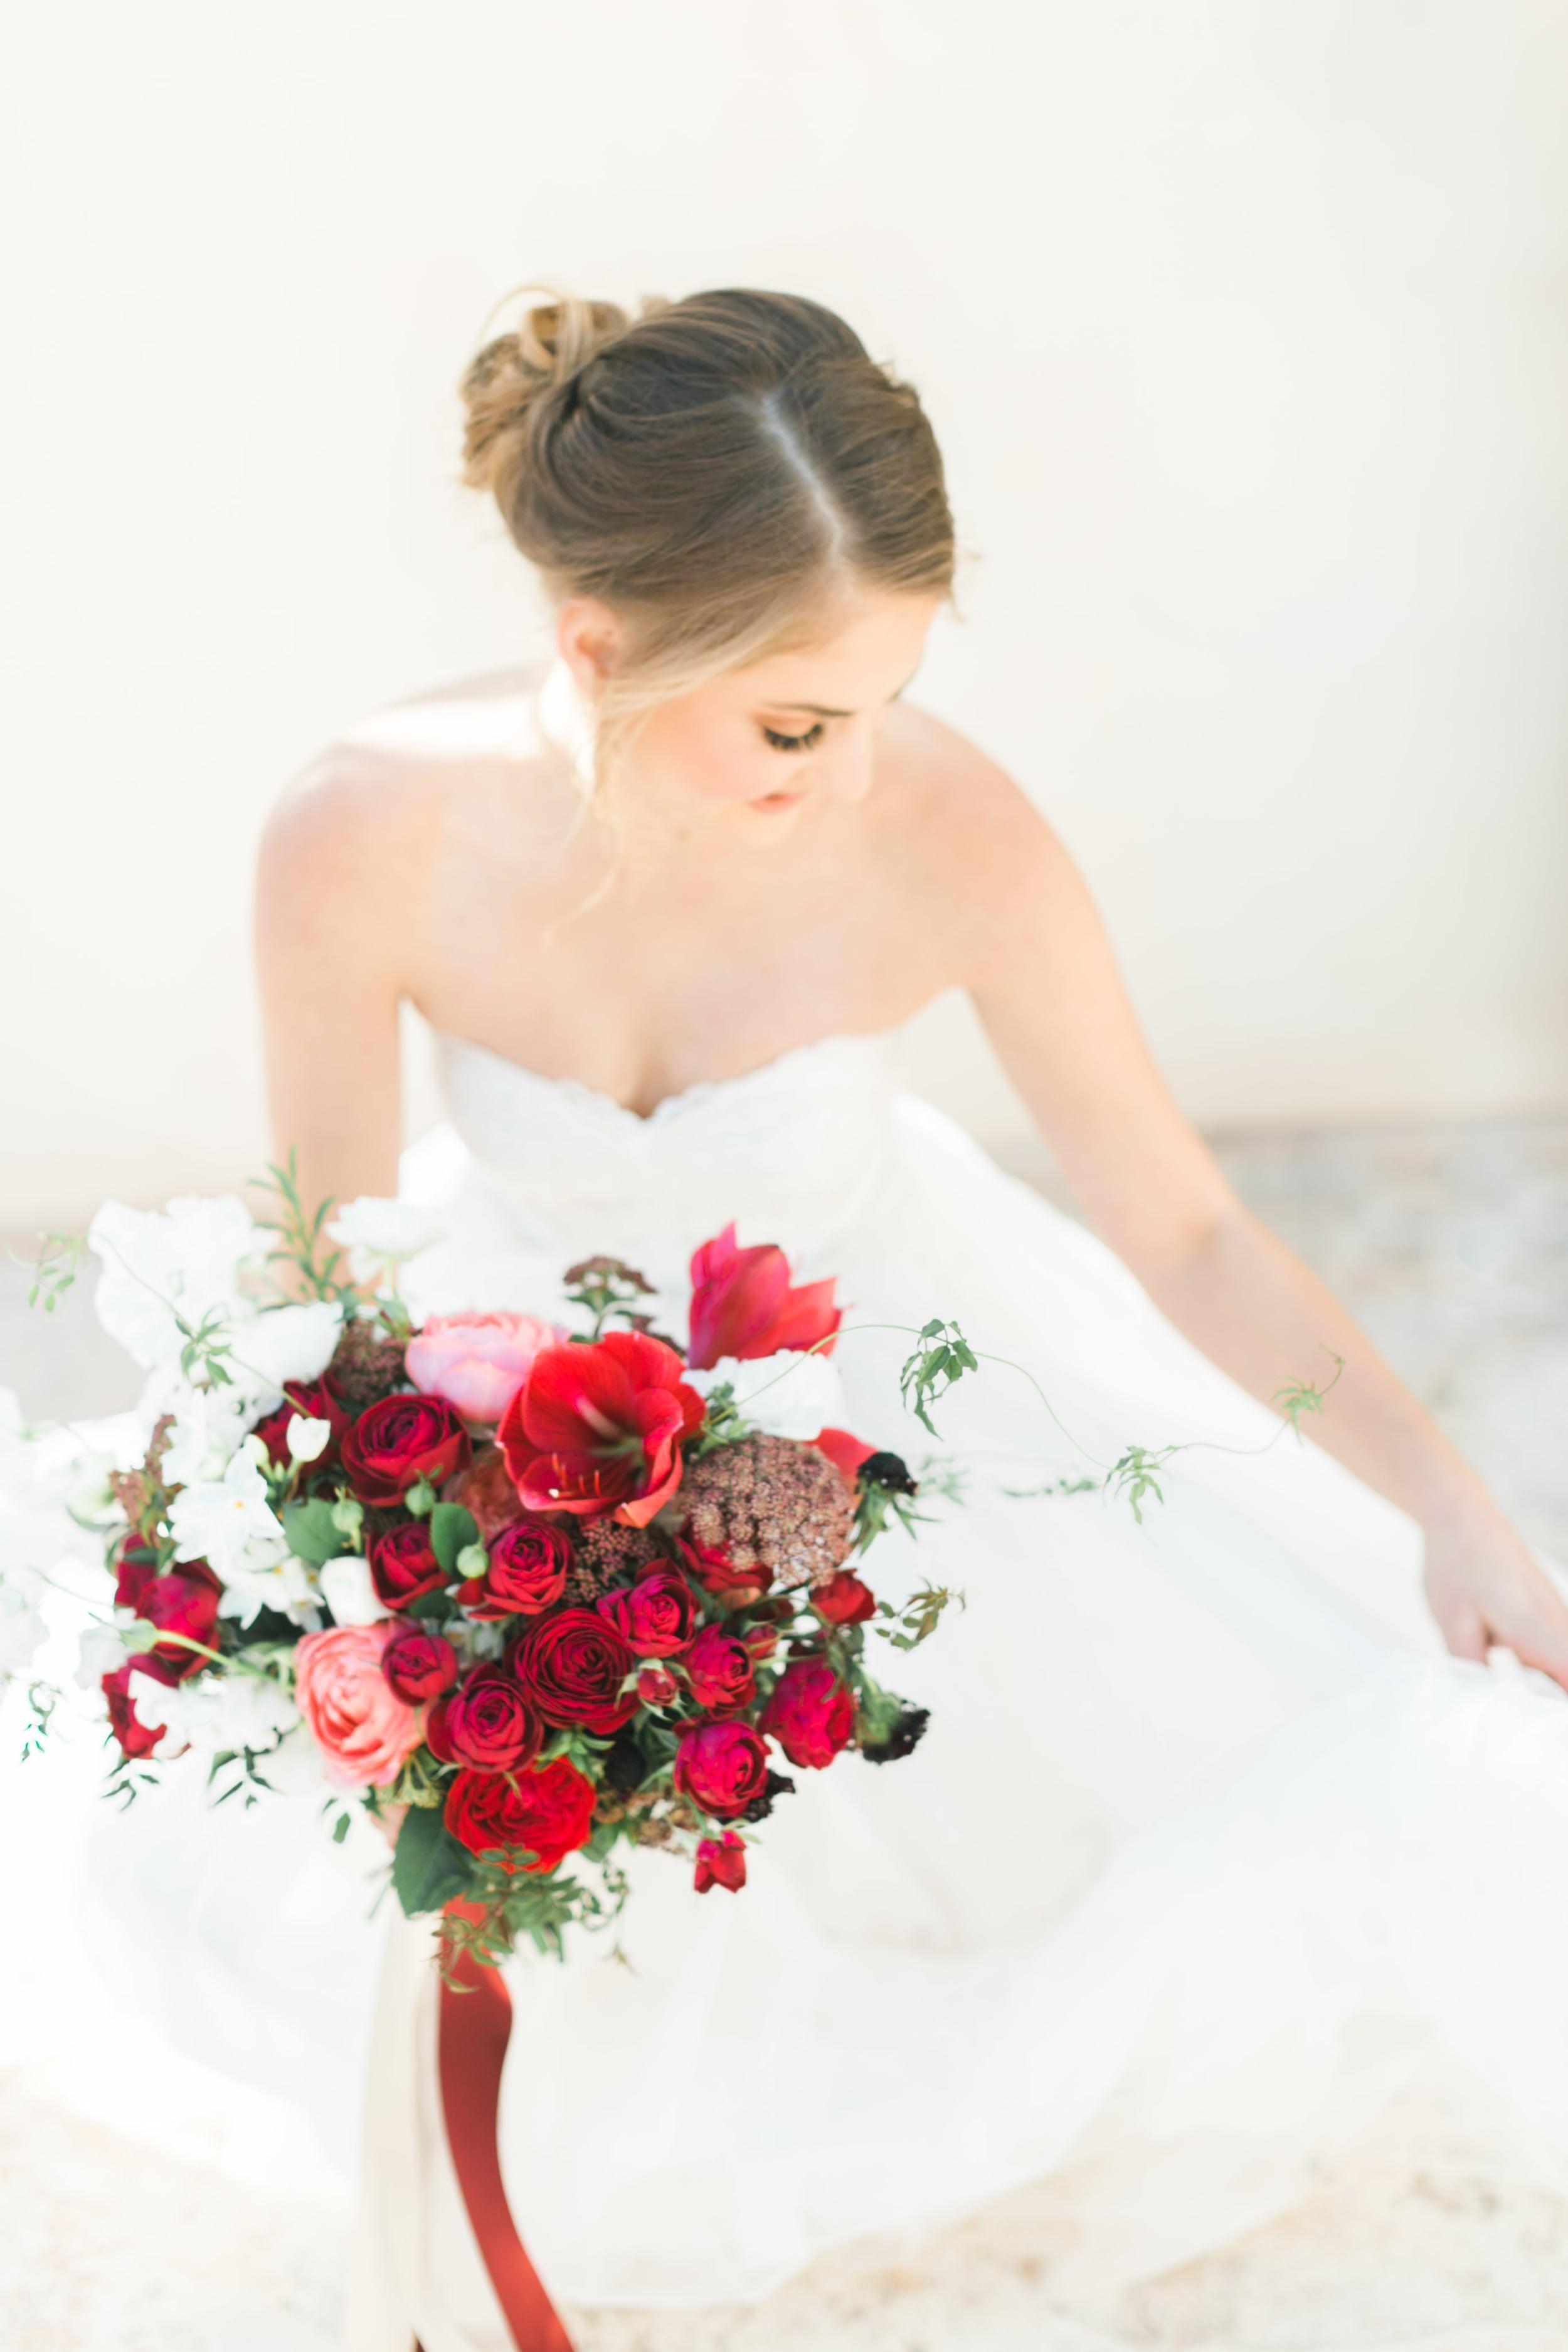 Natalie_Schutt_Photography_Winter_Wedding_San_Luis_Obispo-55.jpg